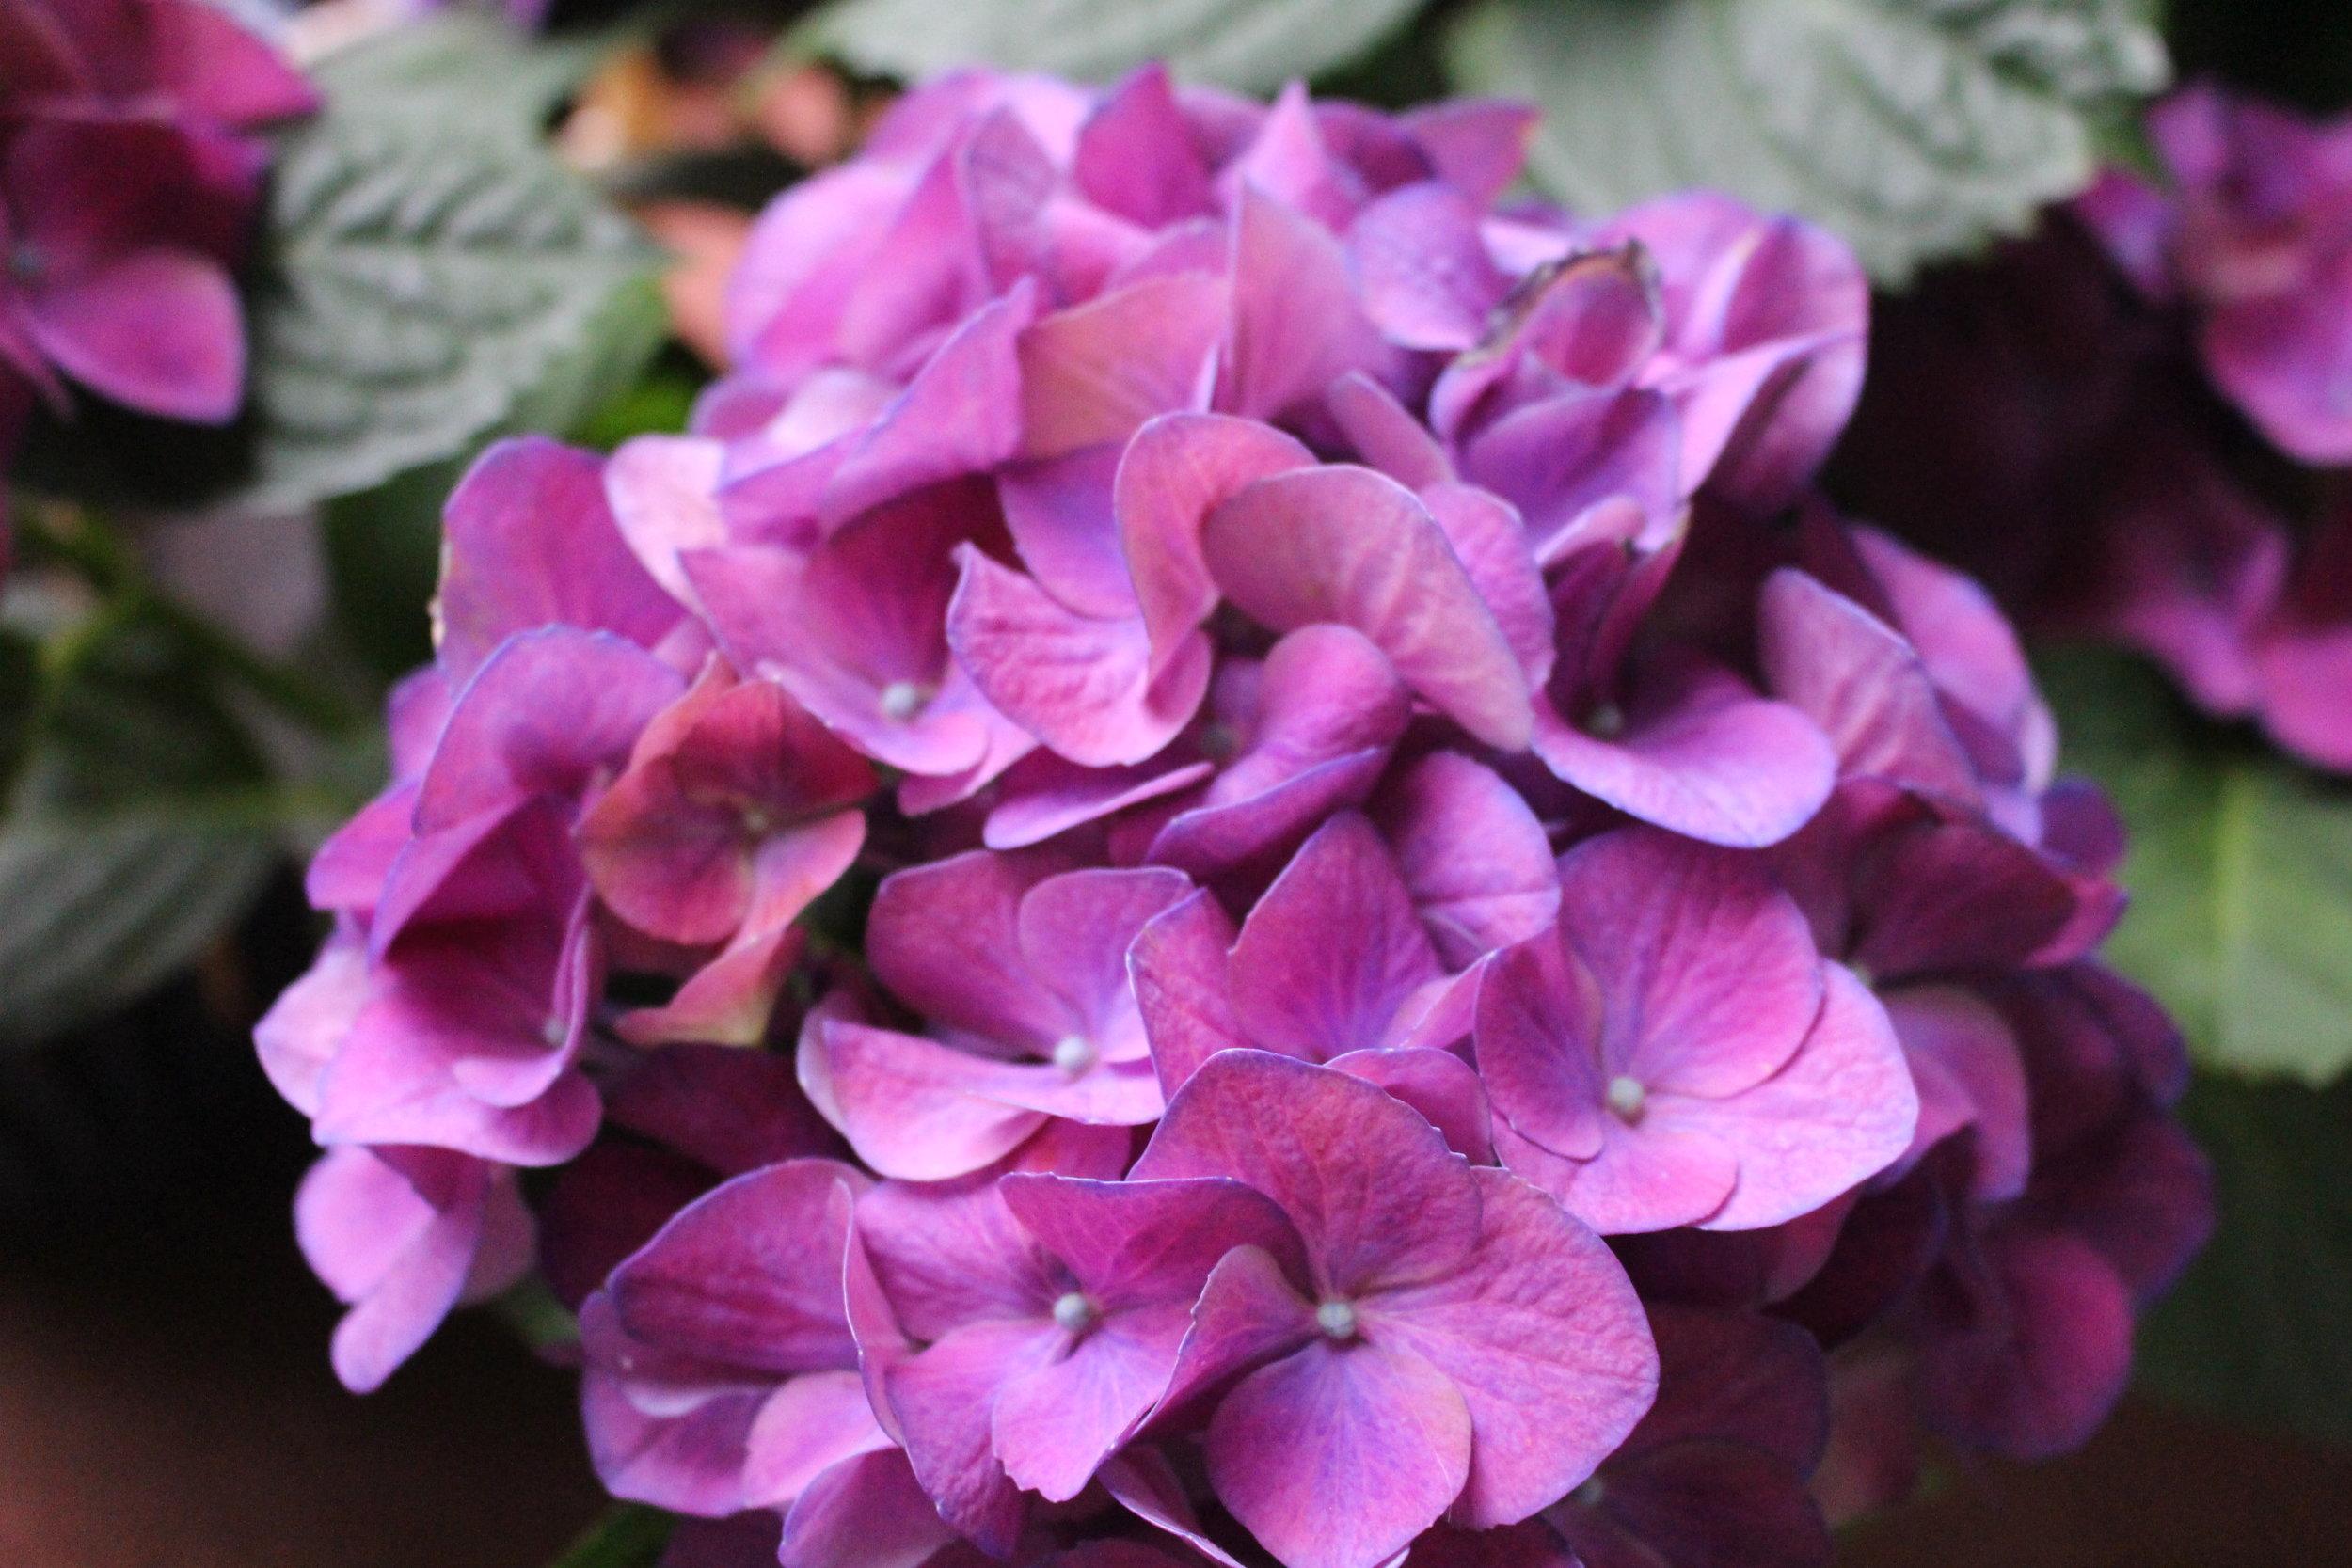 #139 Hydrangea, Hydrangea macrophylla